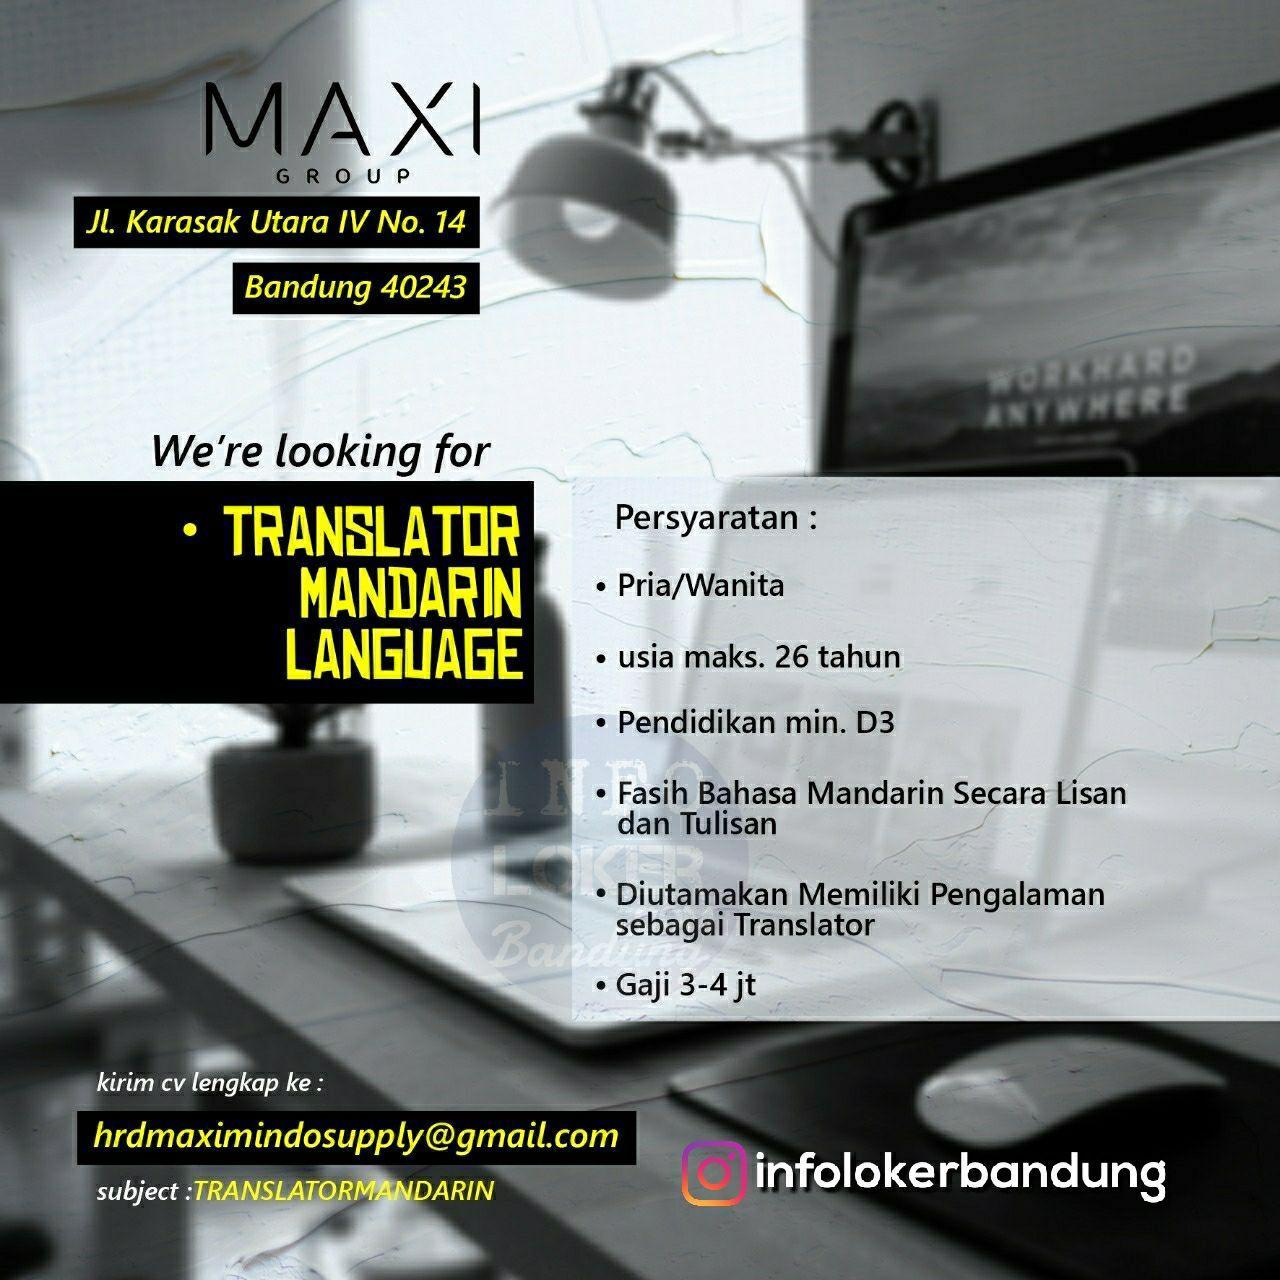 Lowongan Kerja Translator Mandarin Language Maxi Group Bandung September 2018